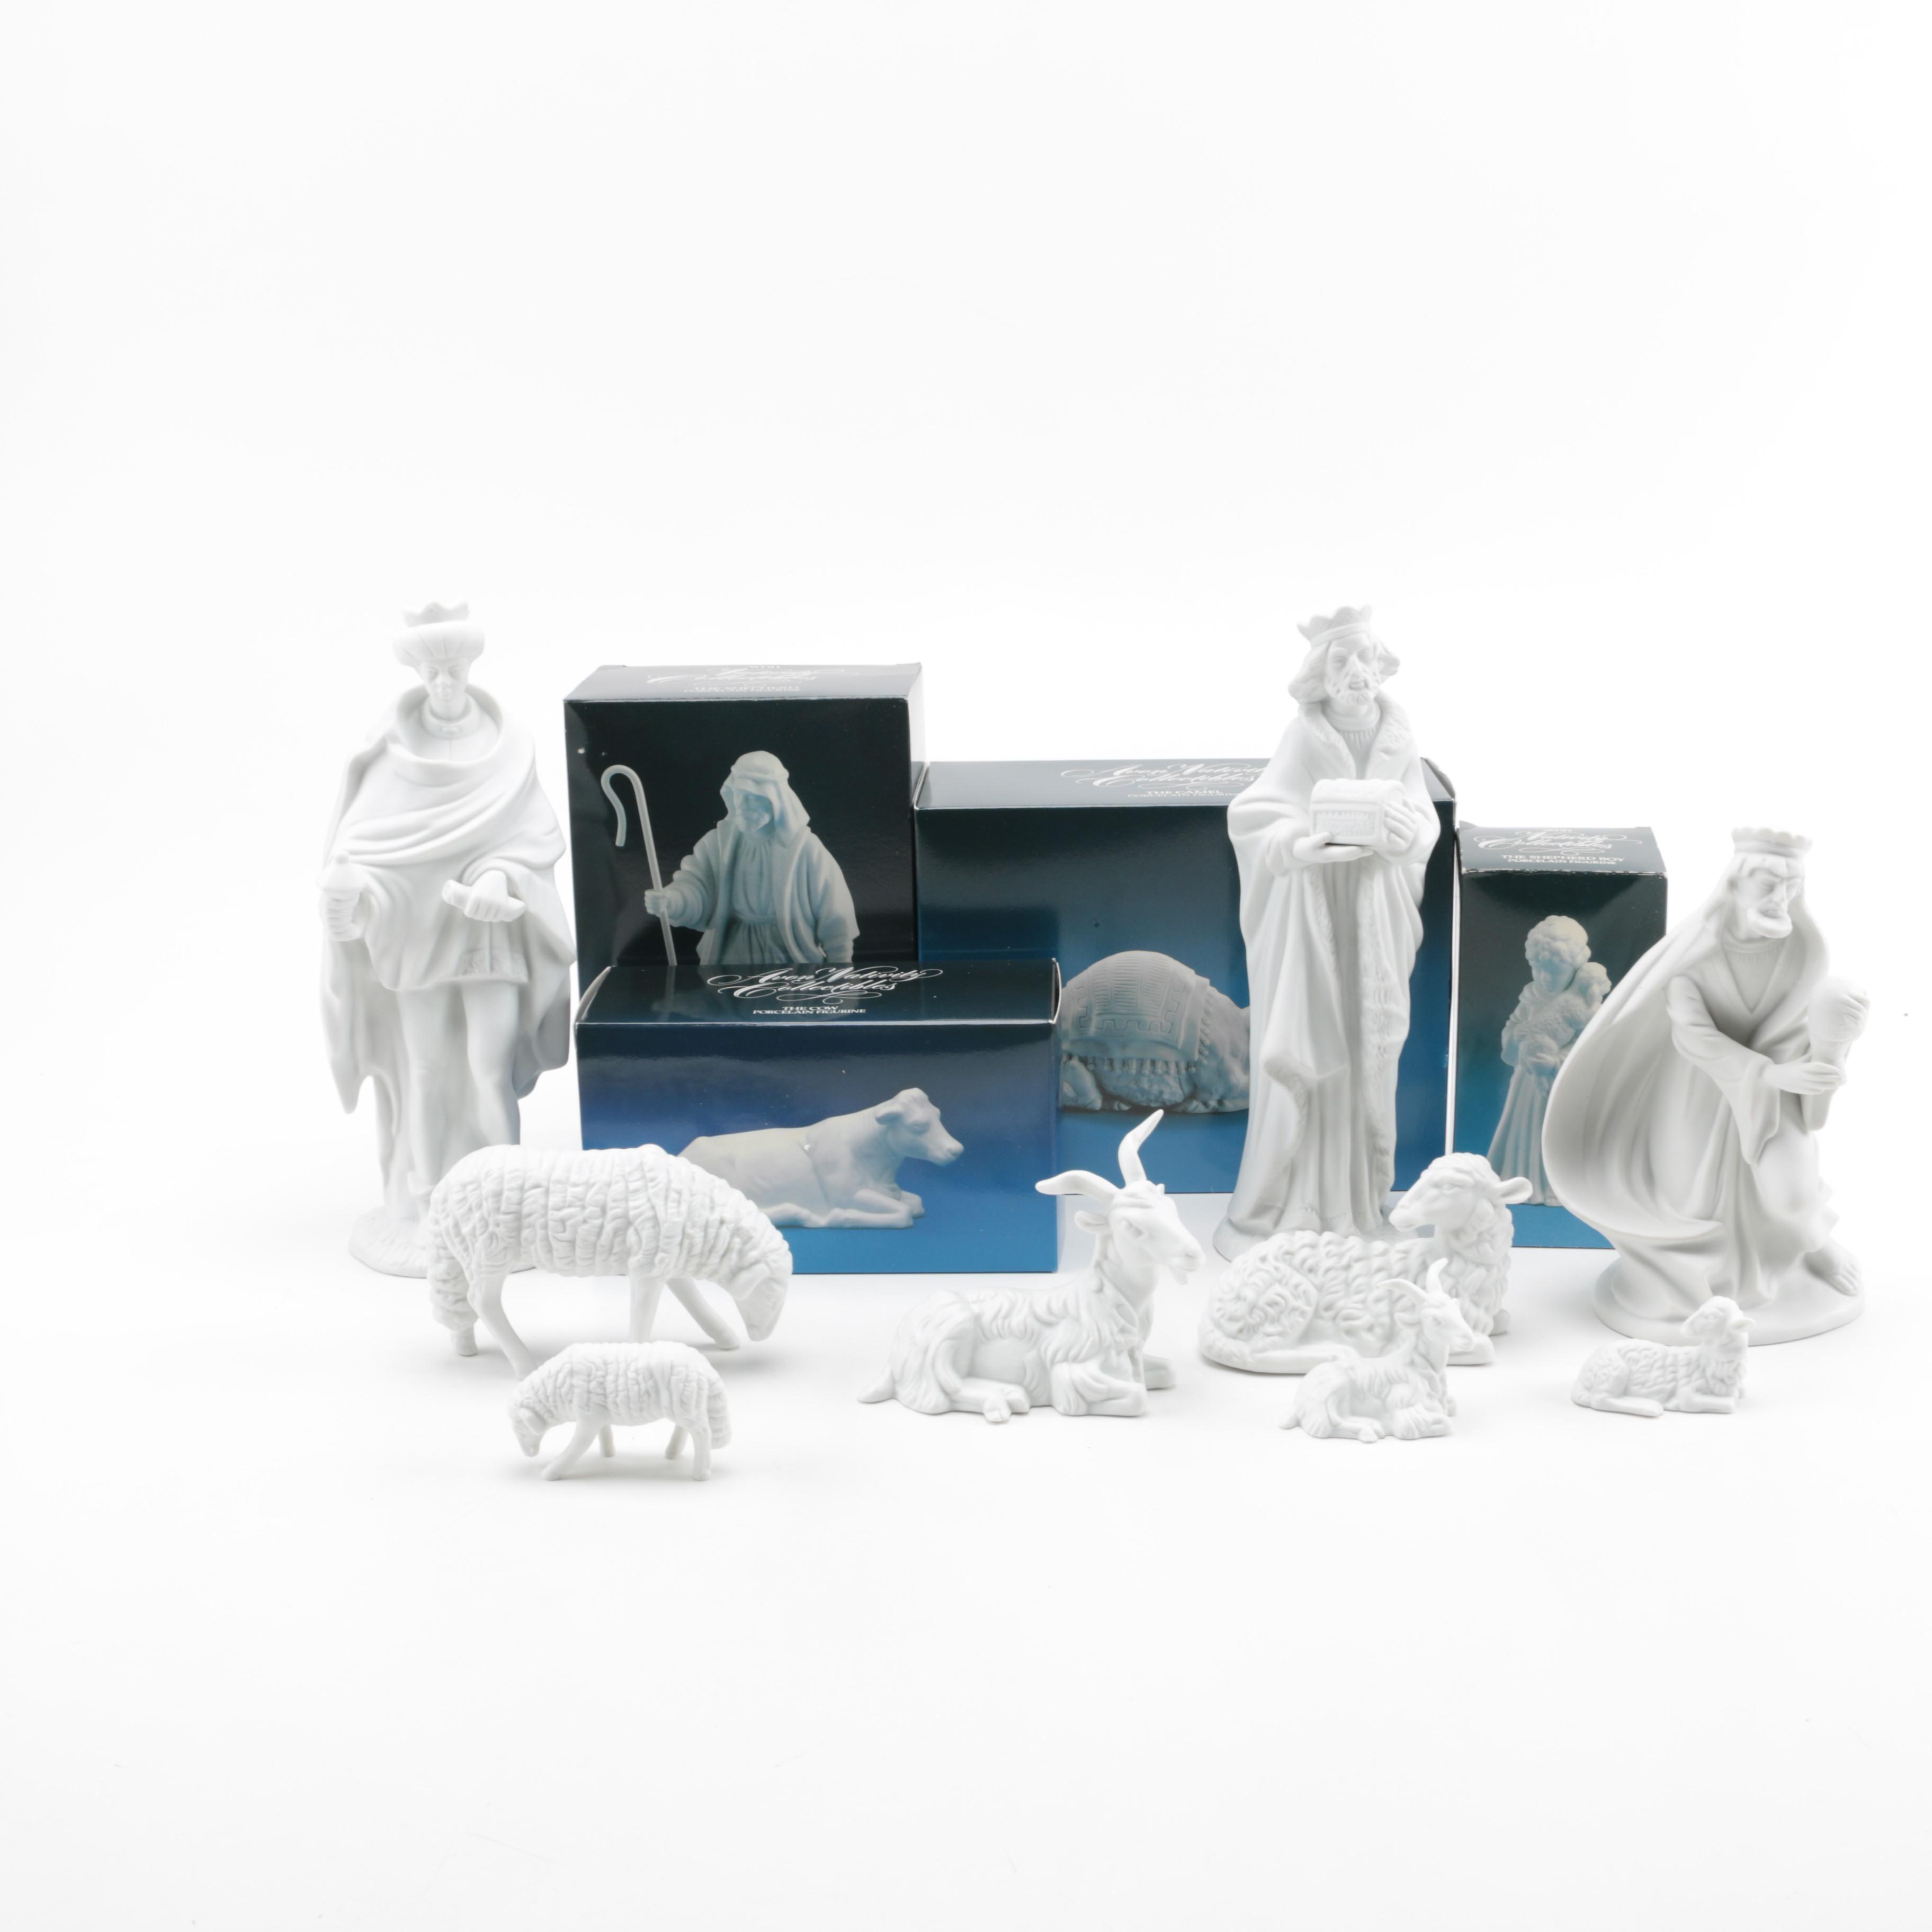 Assorted Avon Nativity Figurines